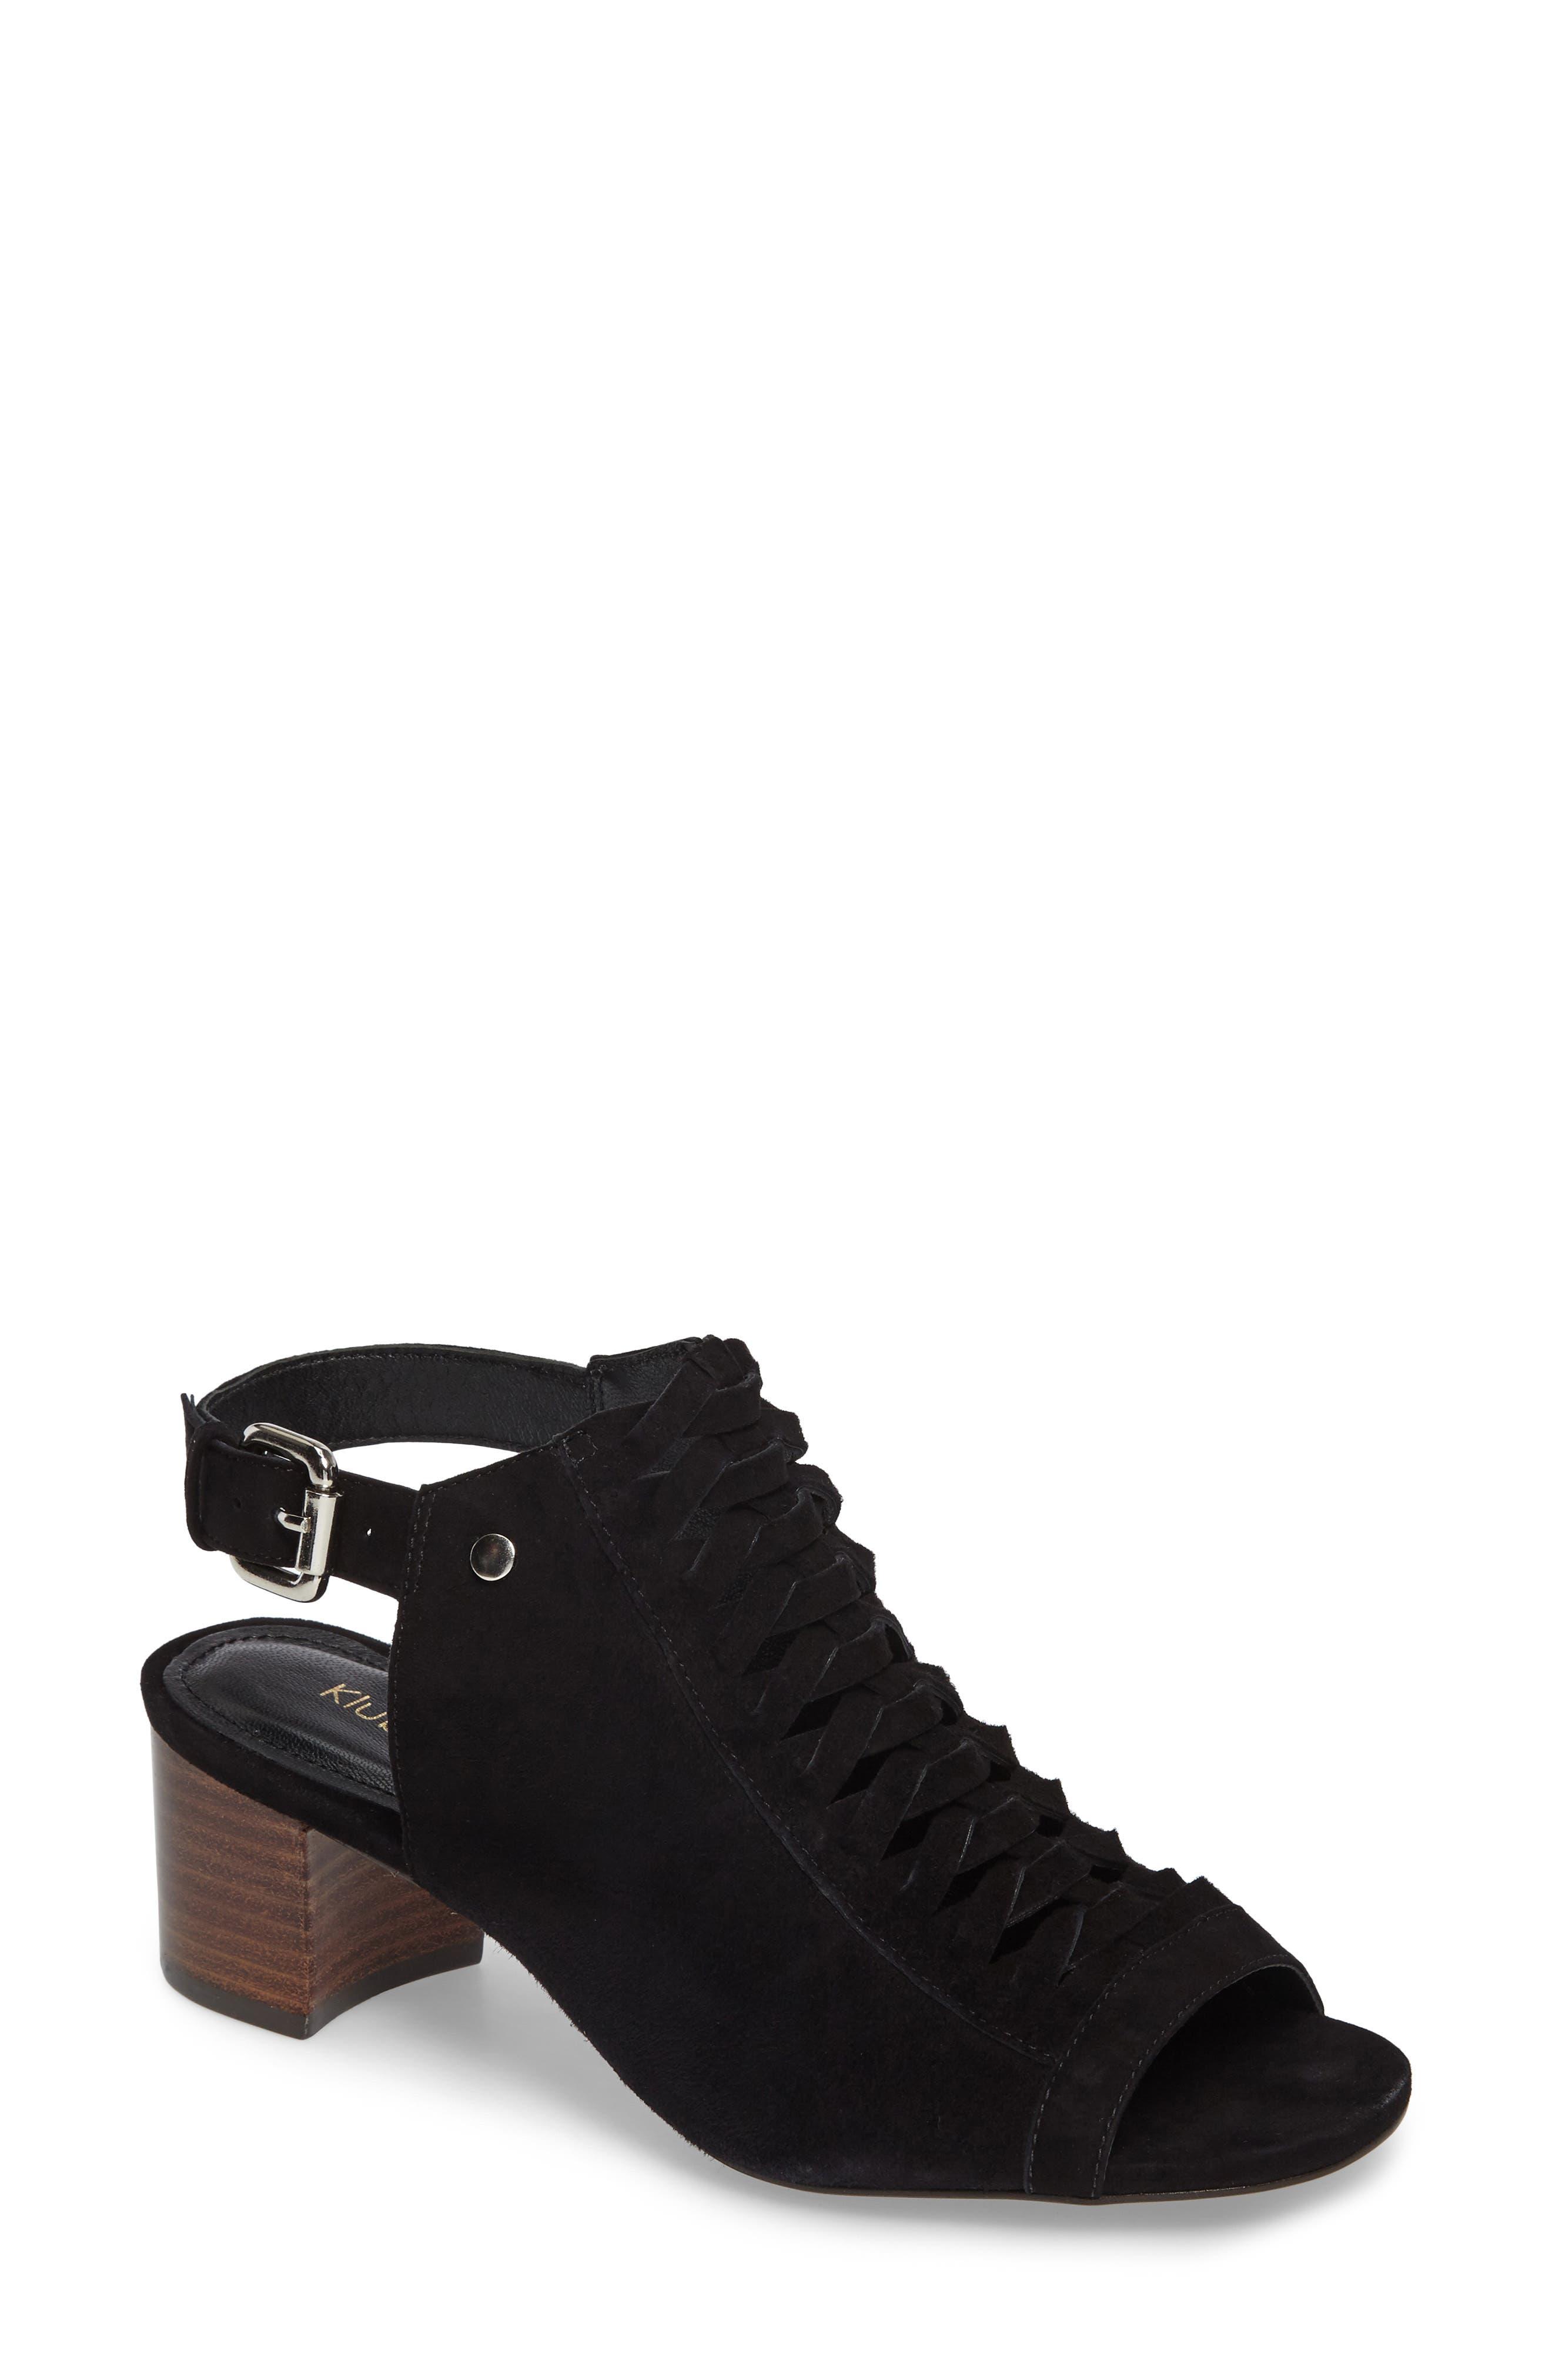 Dallas Woven Sandal,                         Main,                         color, Black Suede